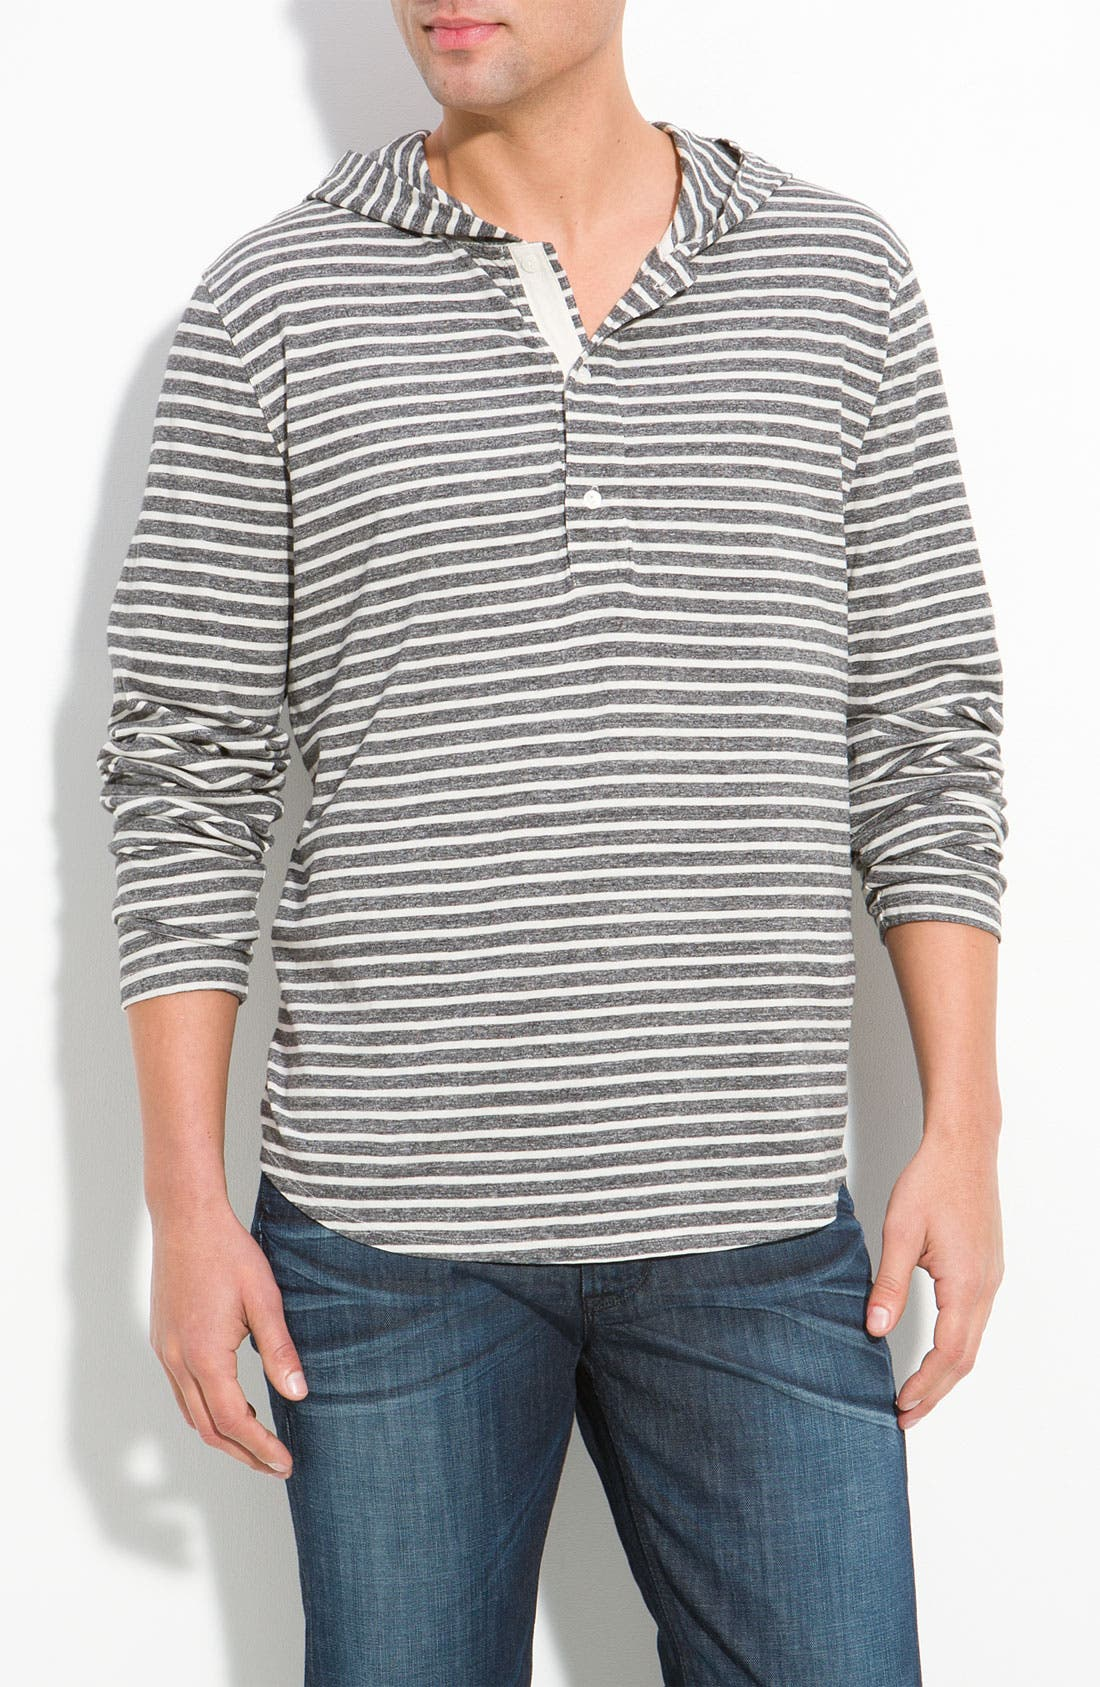 Main Image - NSF Clothing 'Stokes' Stripe Henley Hoodie